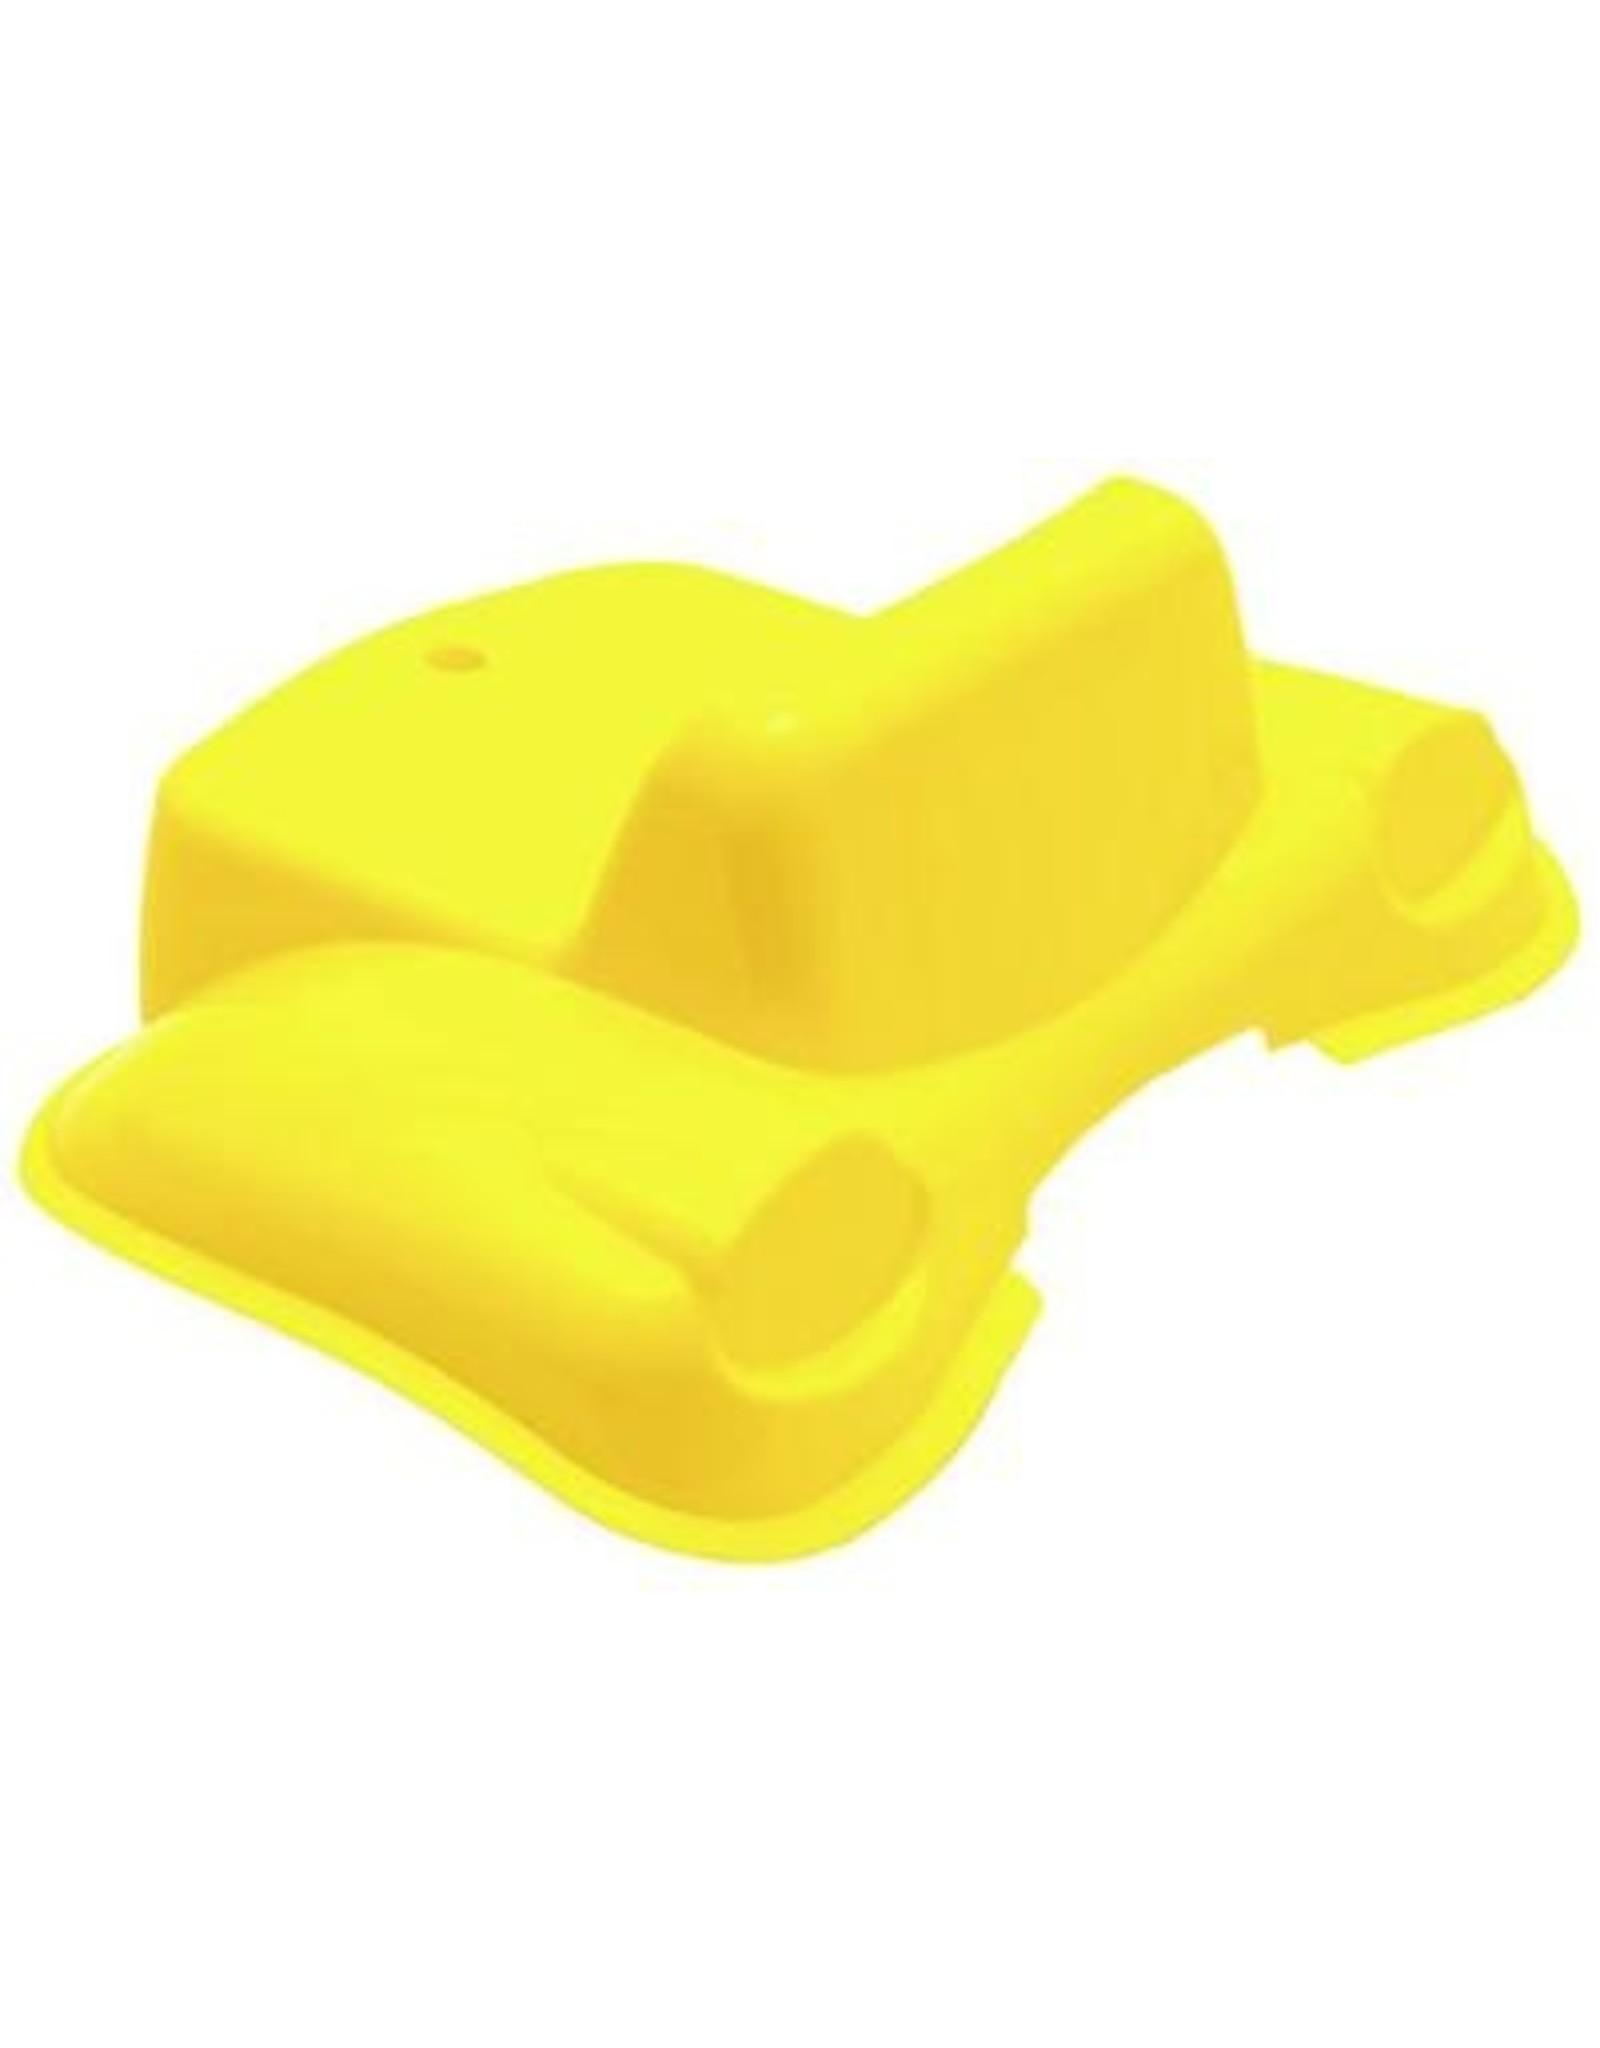 Rolly Toys Spatbord rollyKid John Deere